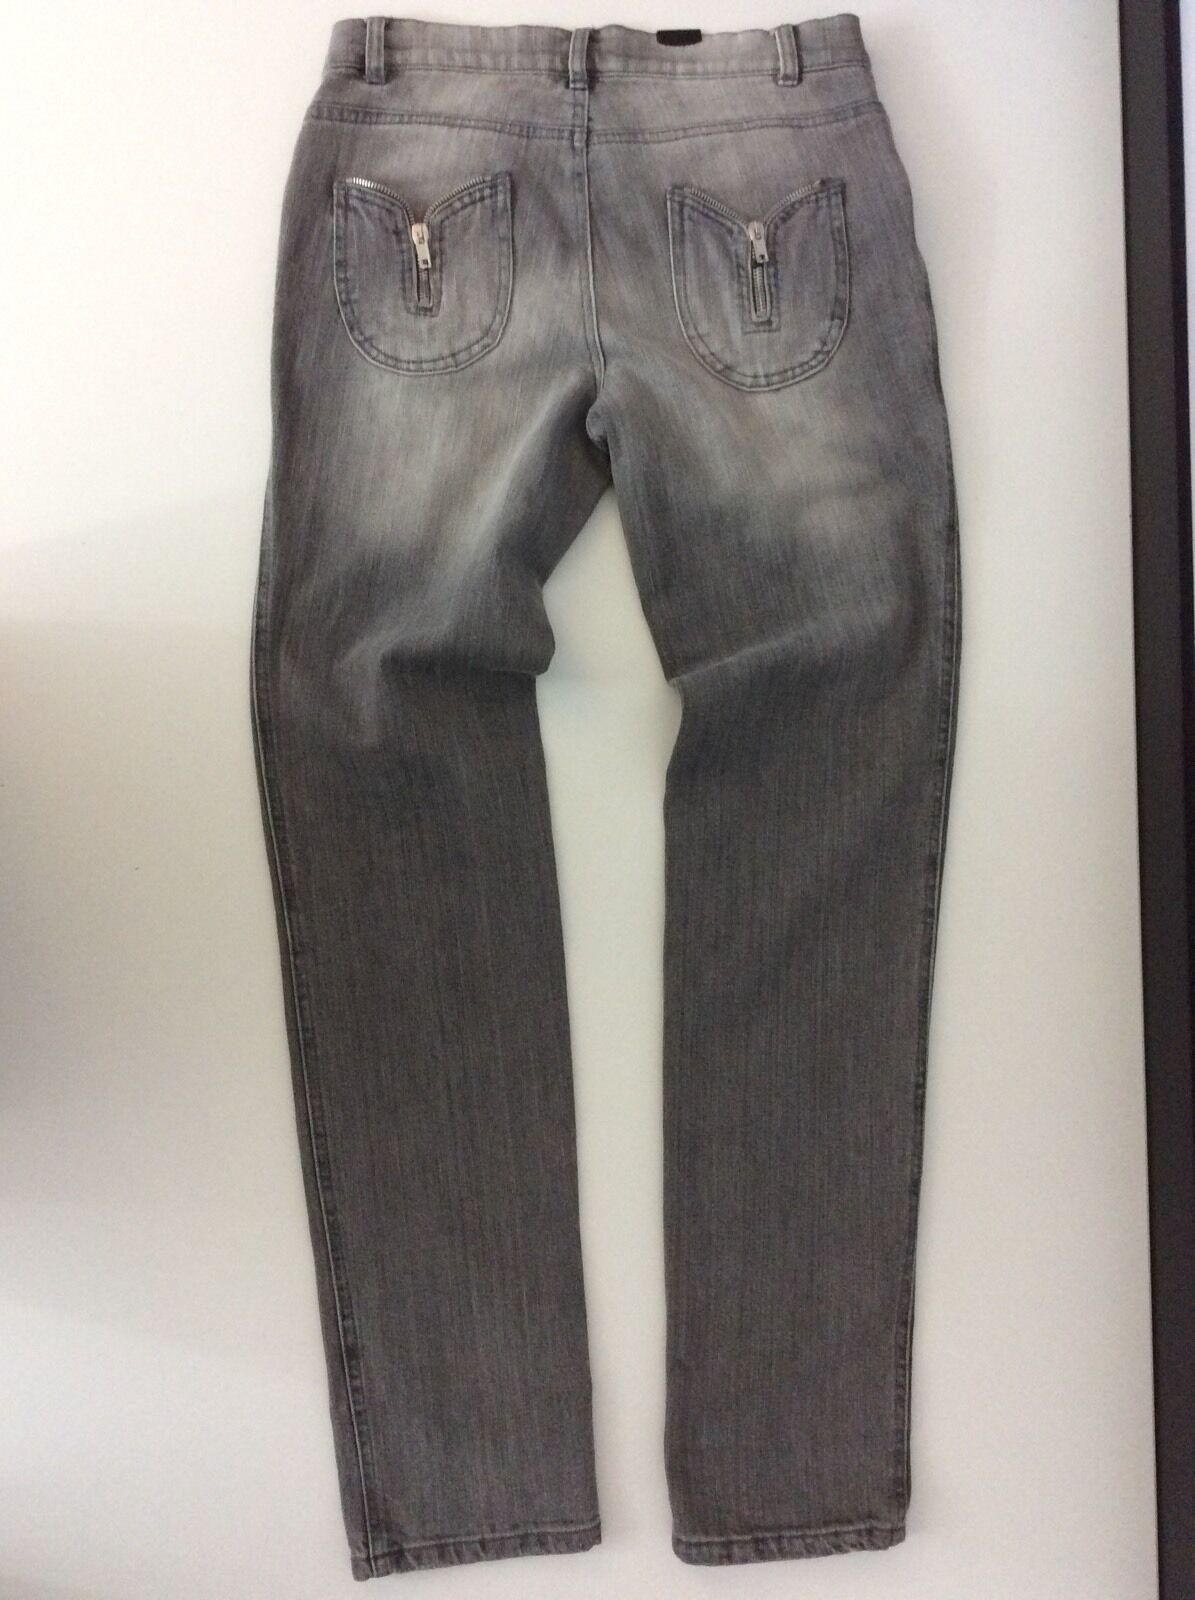 Alexander MCQUEEN MCQ new Grey Women's Jeans Size 40 BNWTS  Leg 32  Inches